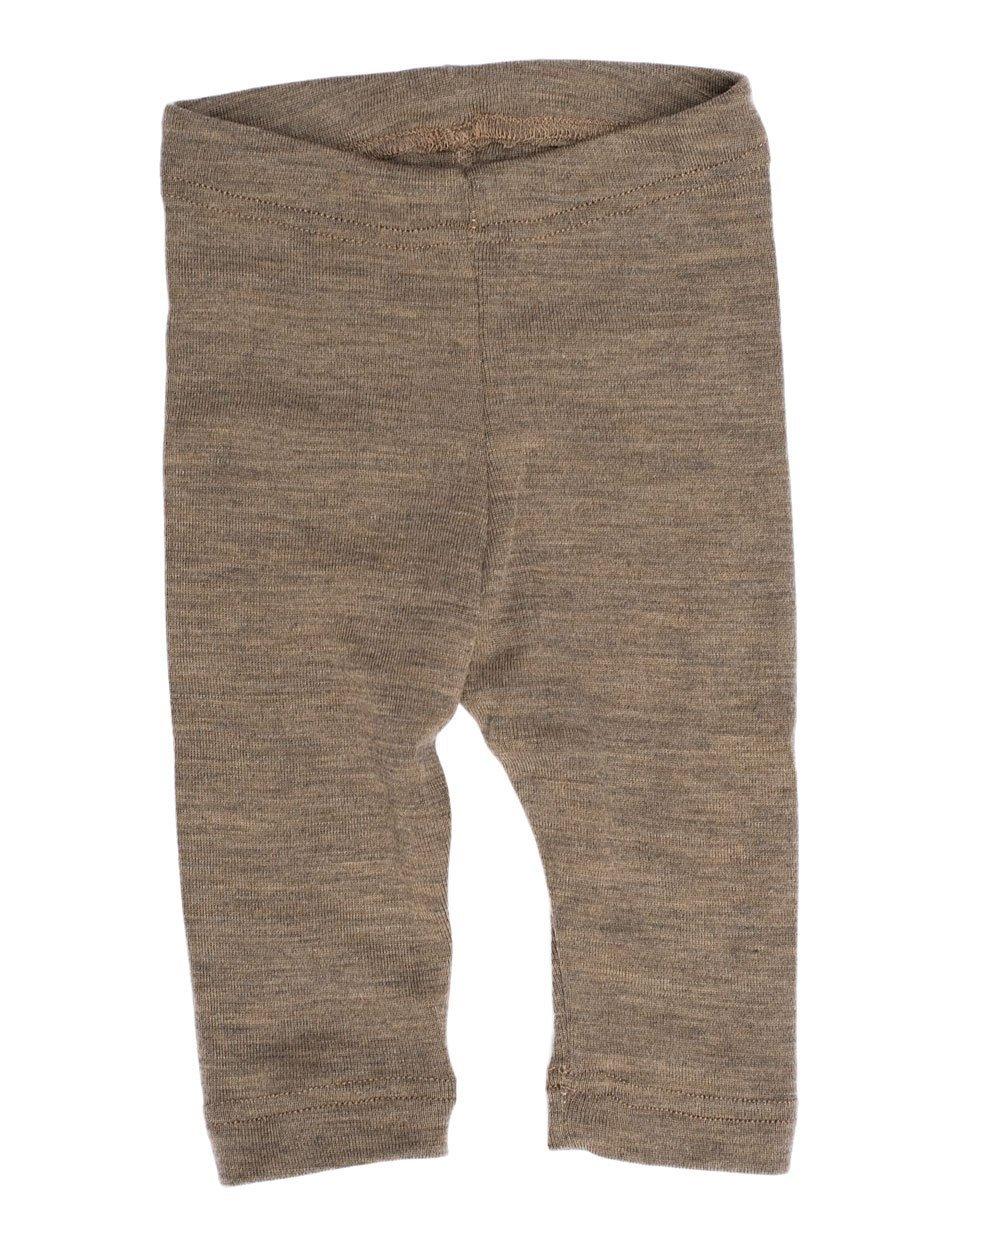 Engel Axil - Baby leggings lana (kbt) y seda ángel natural maschinenw color: nuez, talla: 62/68 1